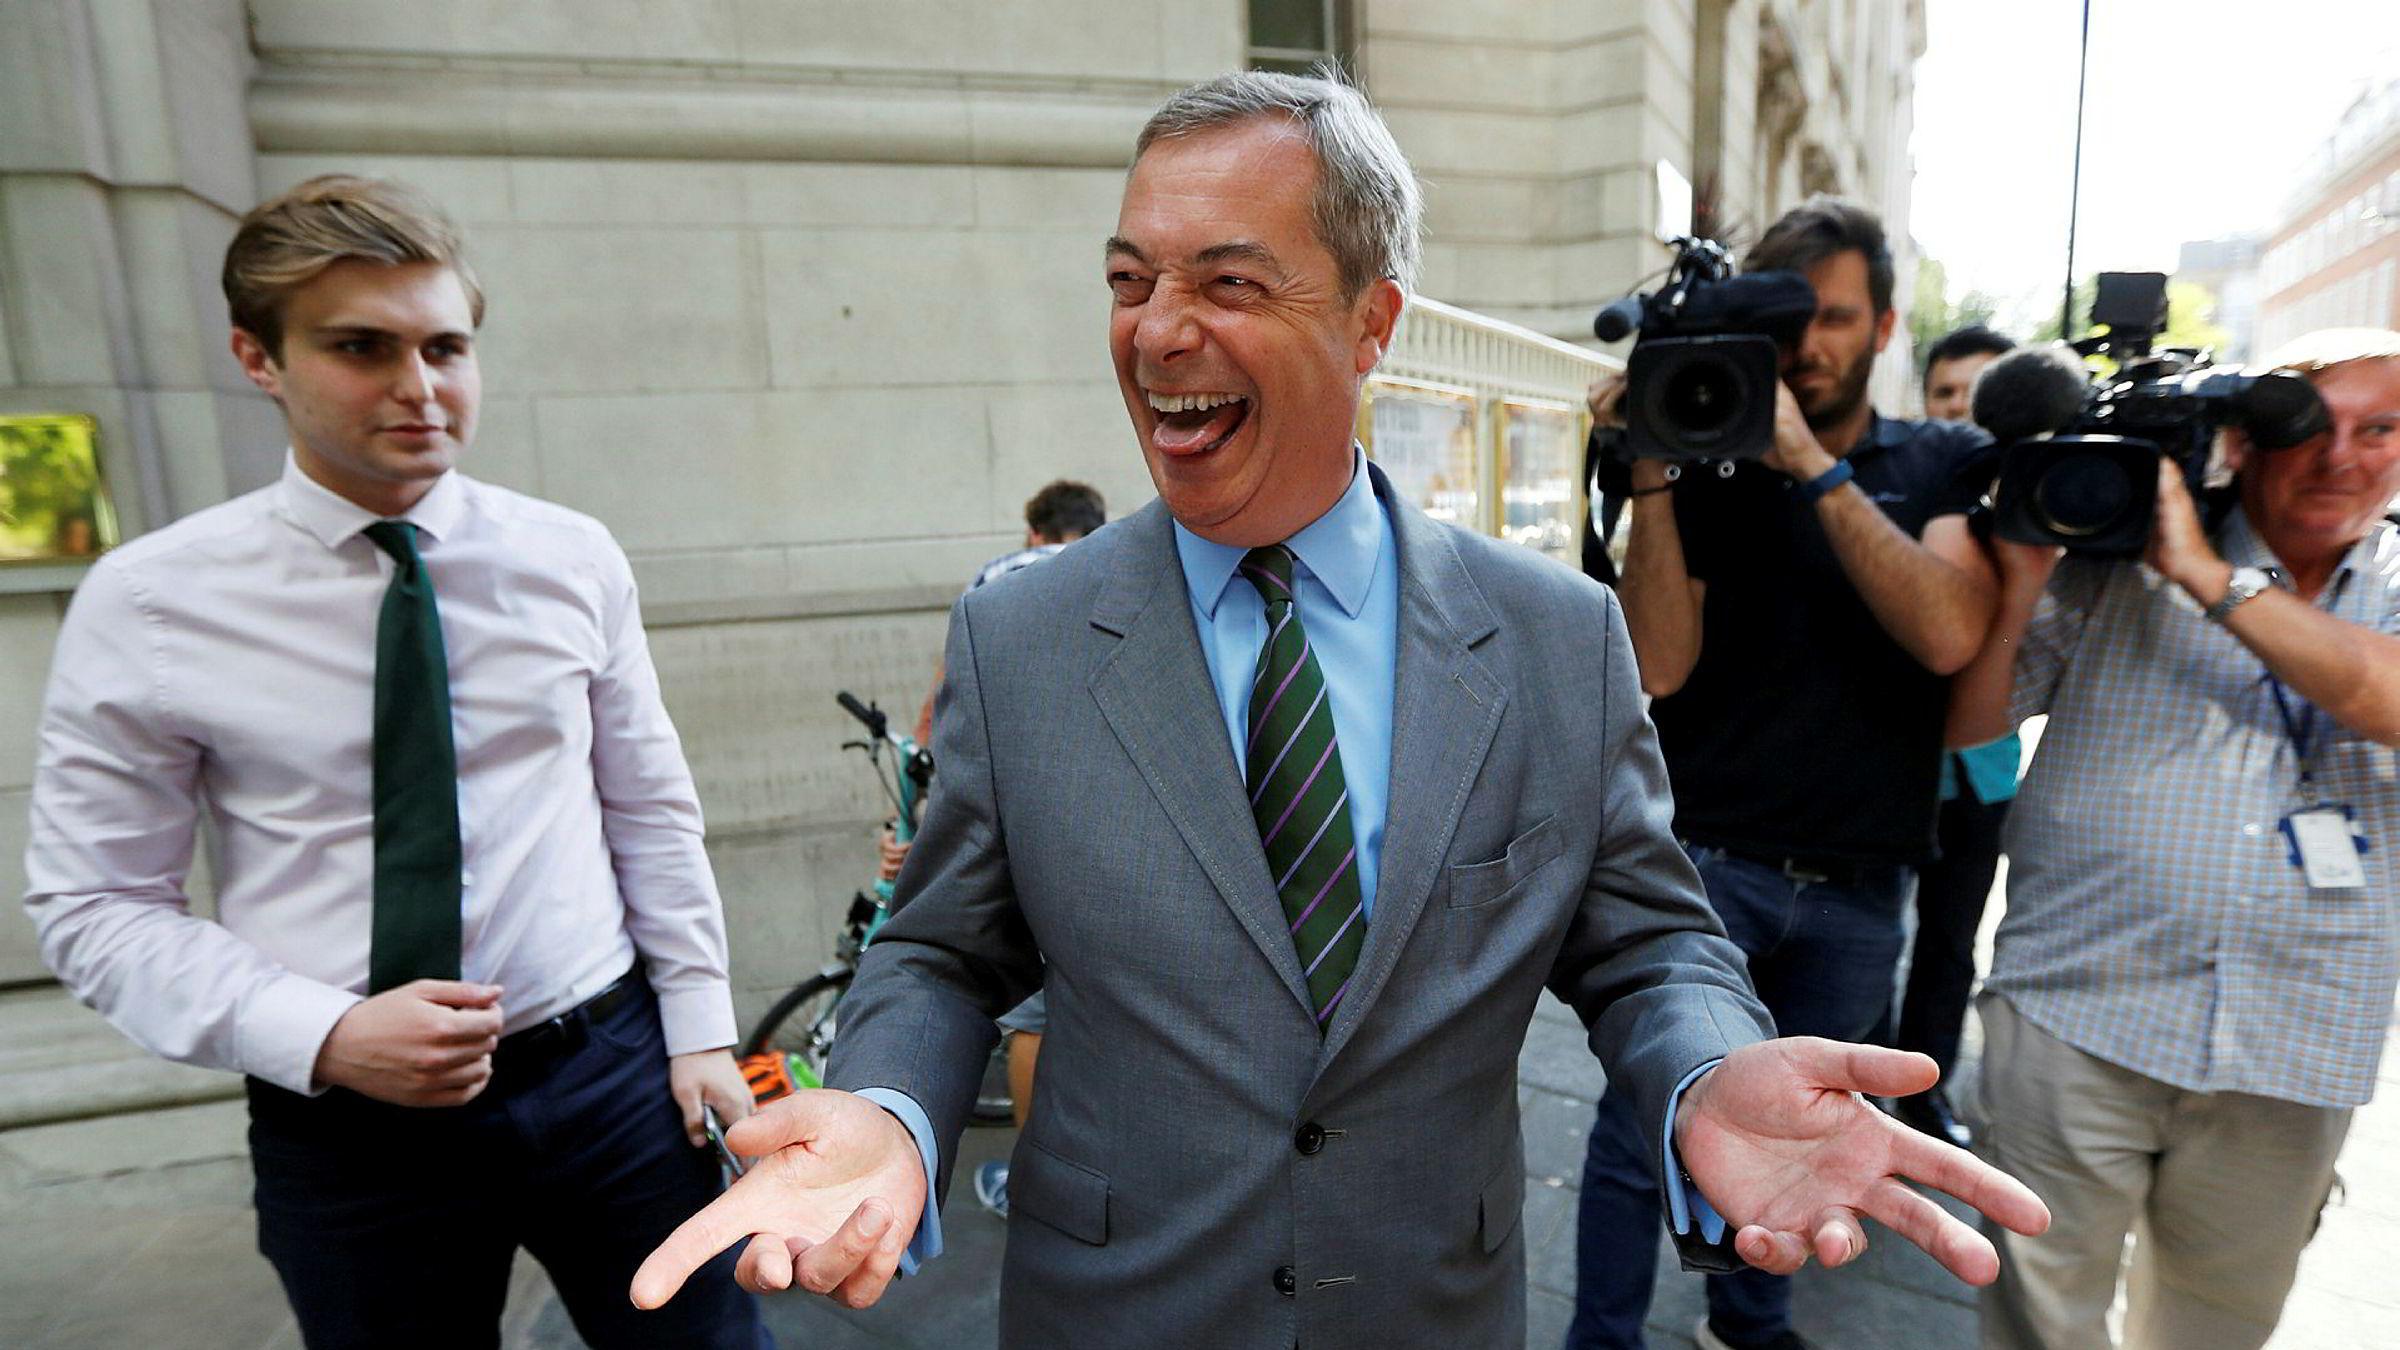 Brexit-general Nigel Farage har «kanskje» forandret mening om en ny folkeavstemning om brexit.